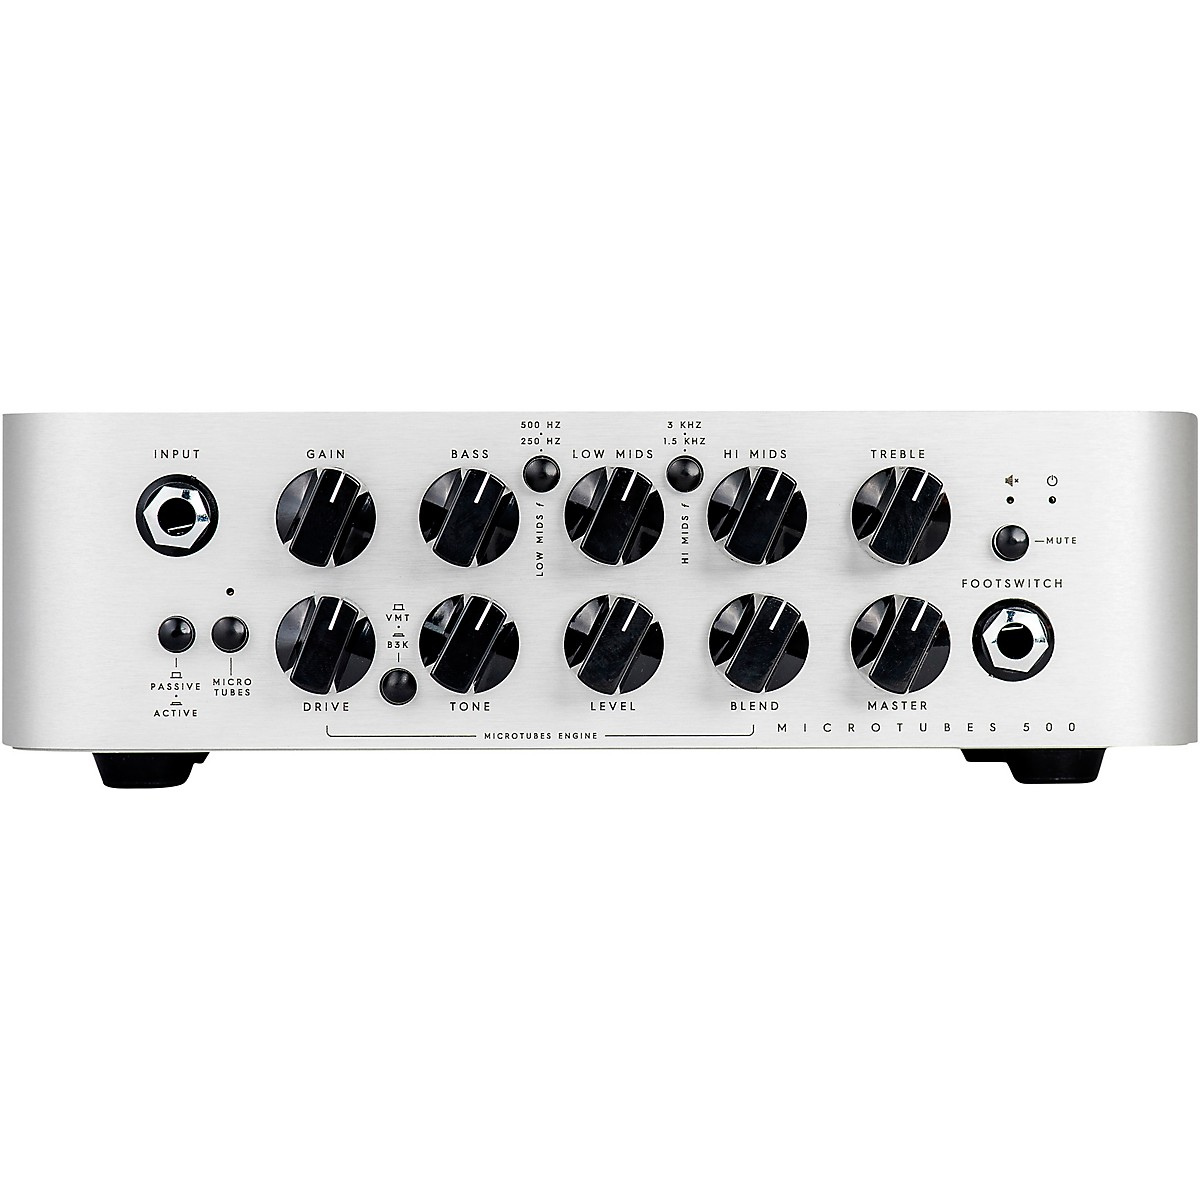 Darkglass Microtubes 500 500W Bass Amp Head